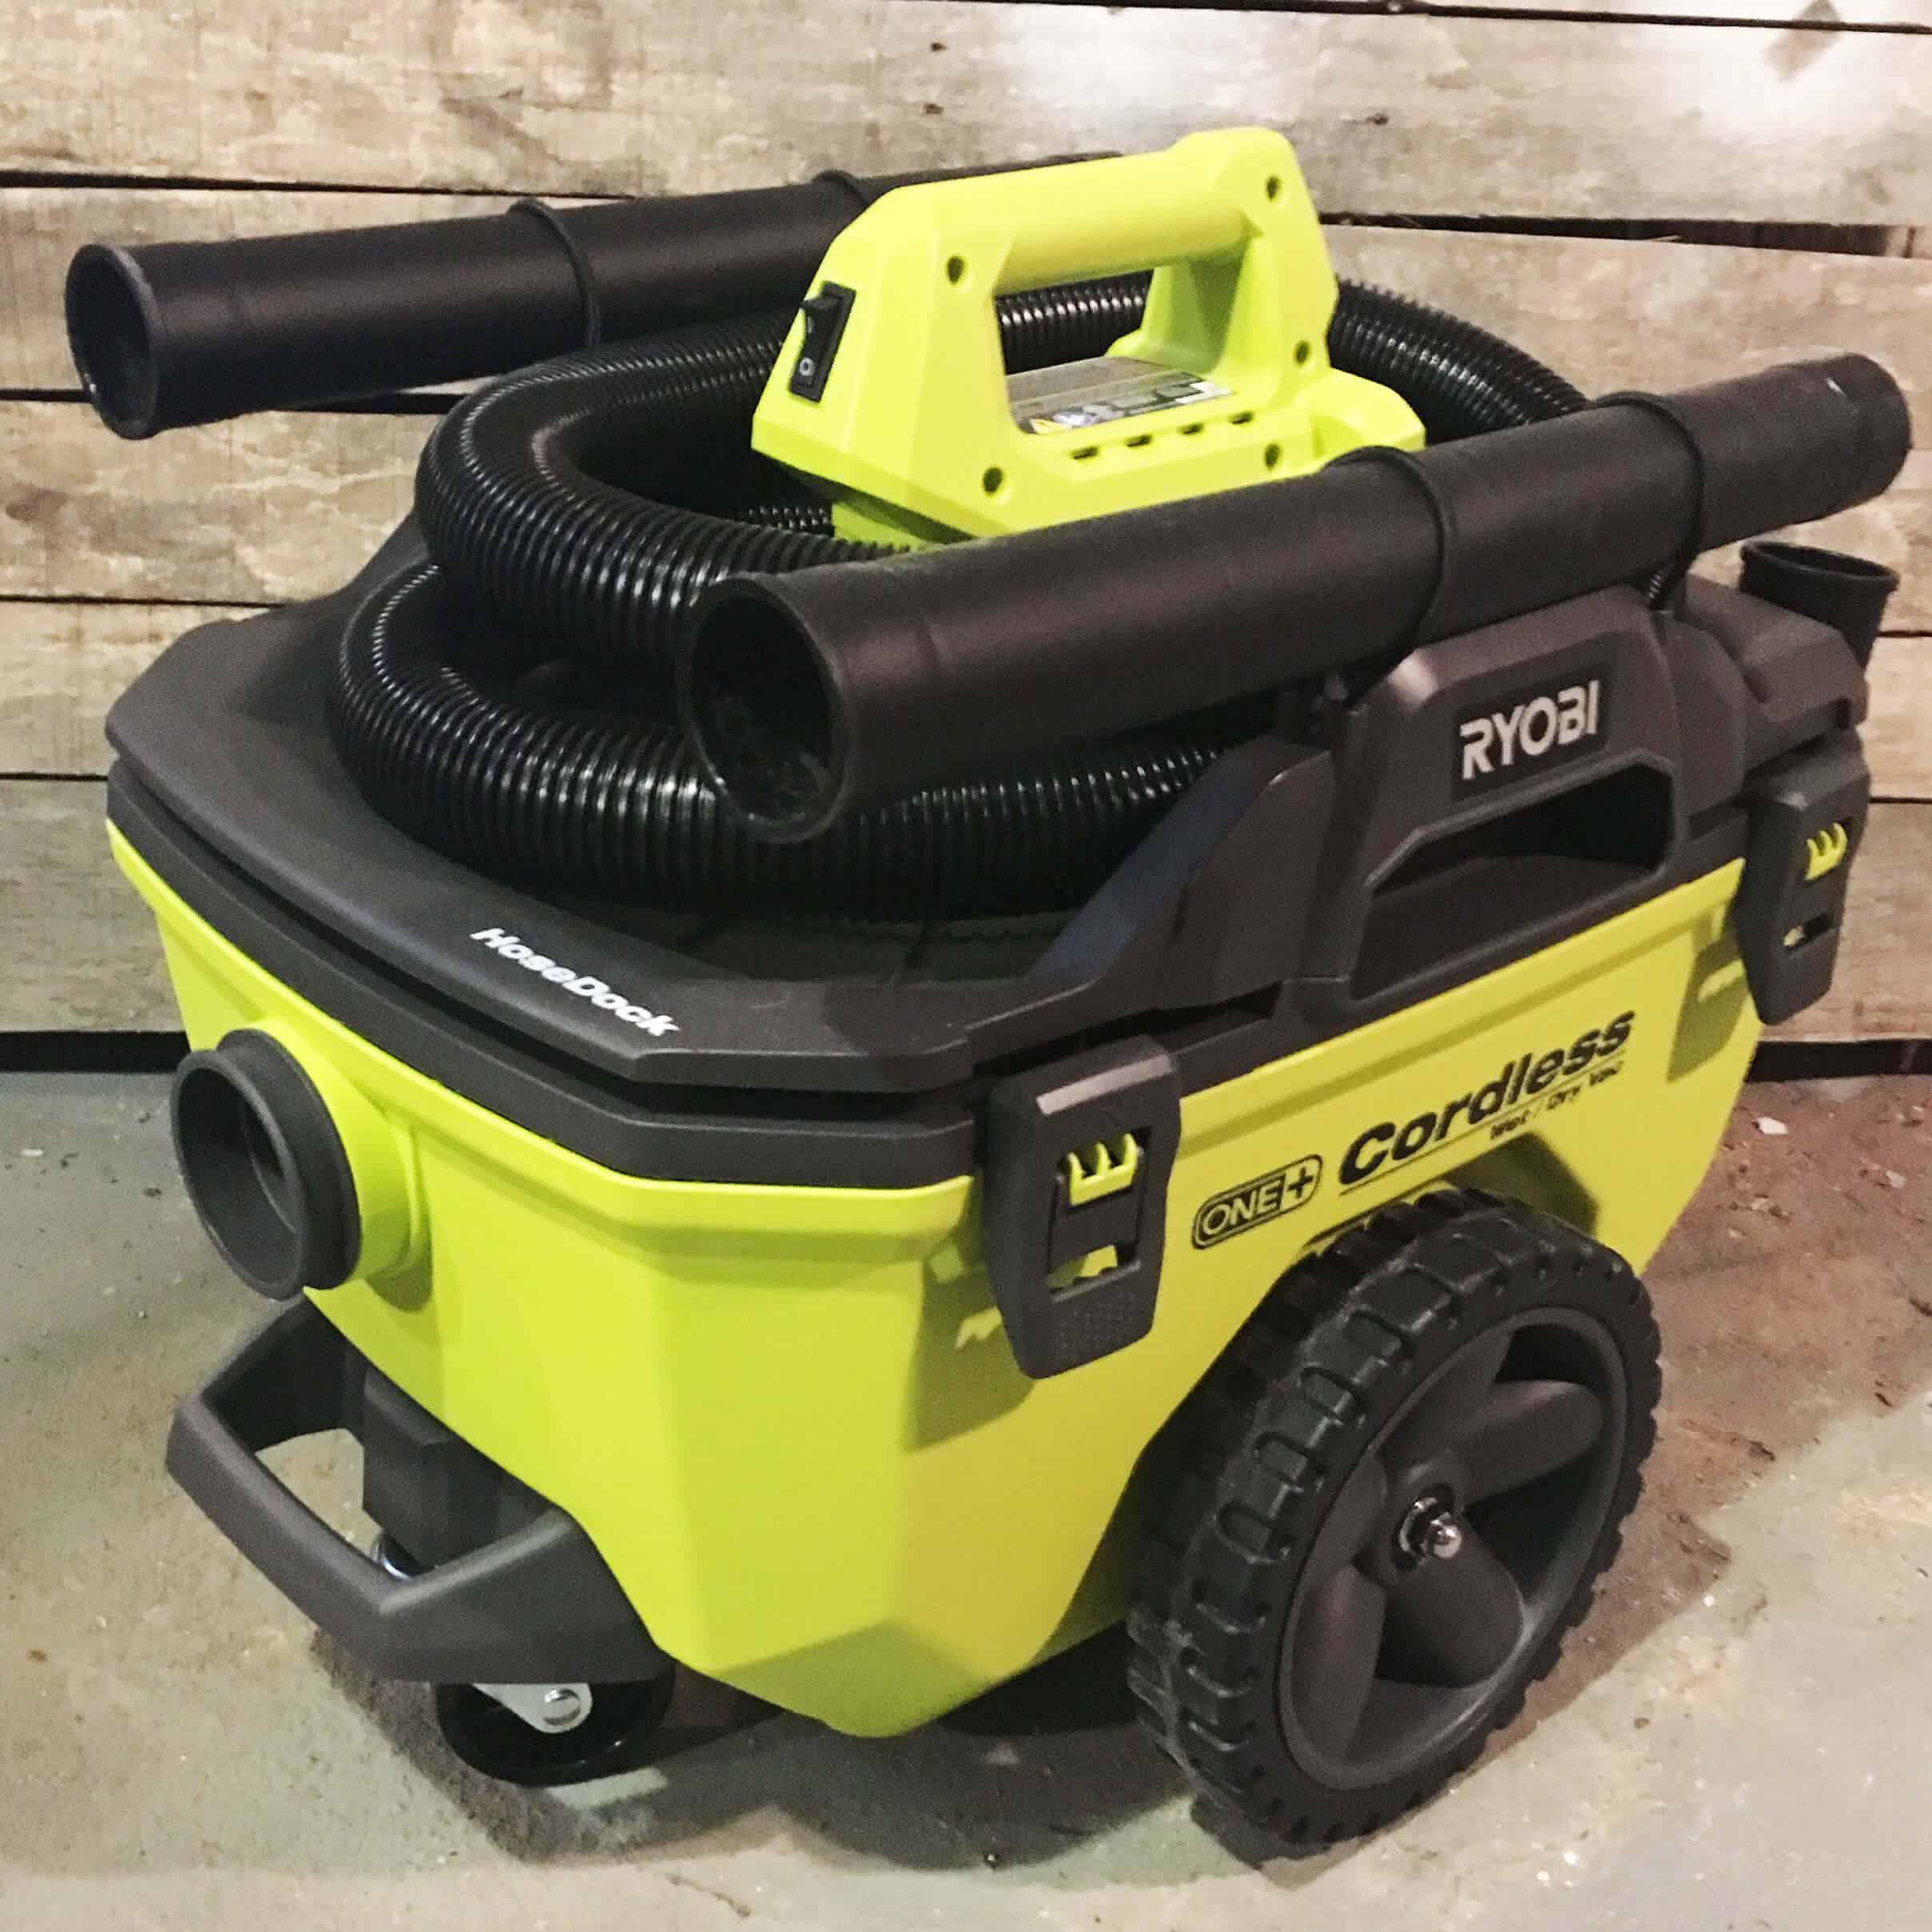 Ryobi One+ 18v Wet/Dry Vac and Stick Vacuum Review - Lazy Guy DIY